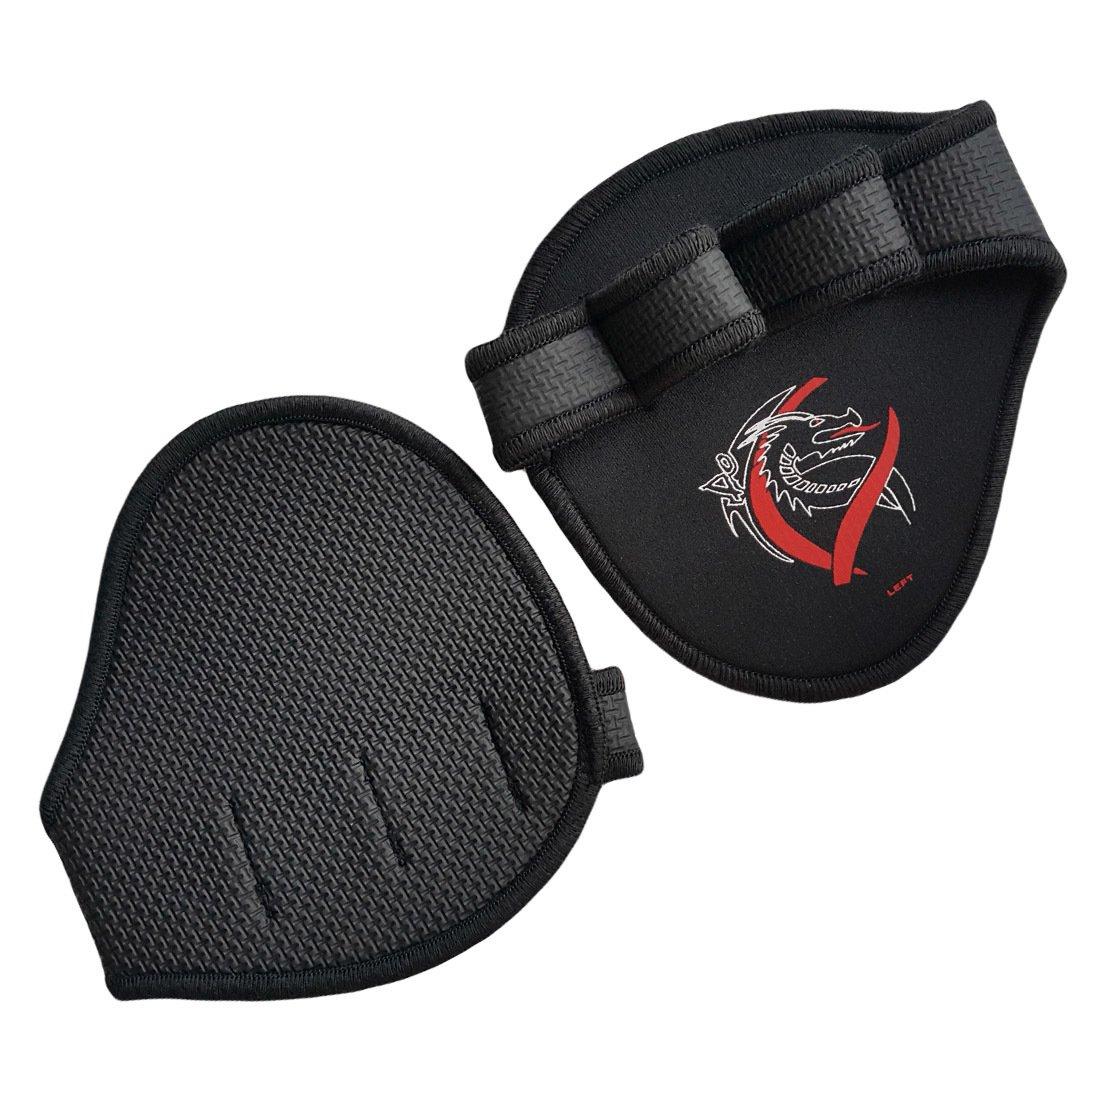 fitness-eldiveni-dragon-griped-grippad-pad-dambil-halter-ve-agirlik-calisma-eldiveni-siyah-